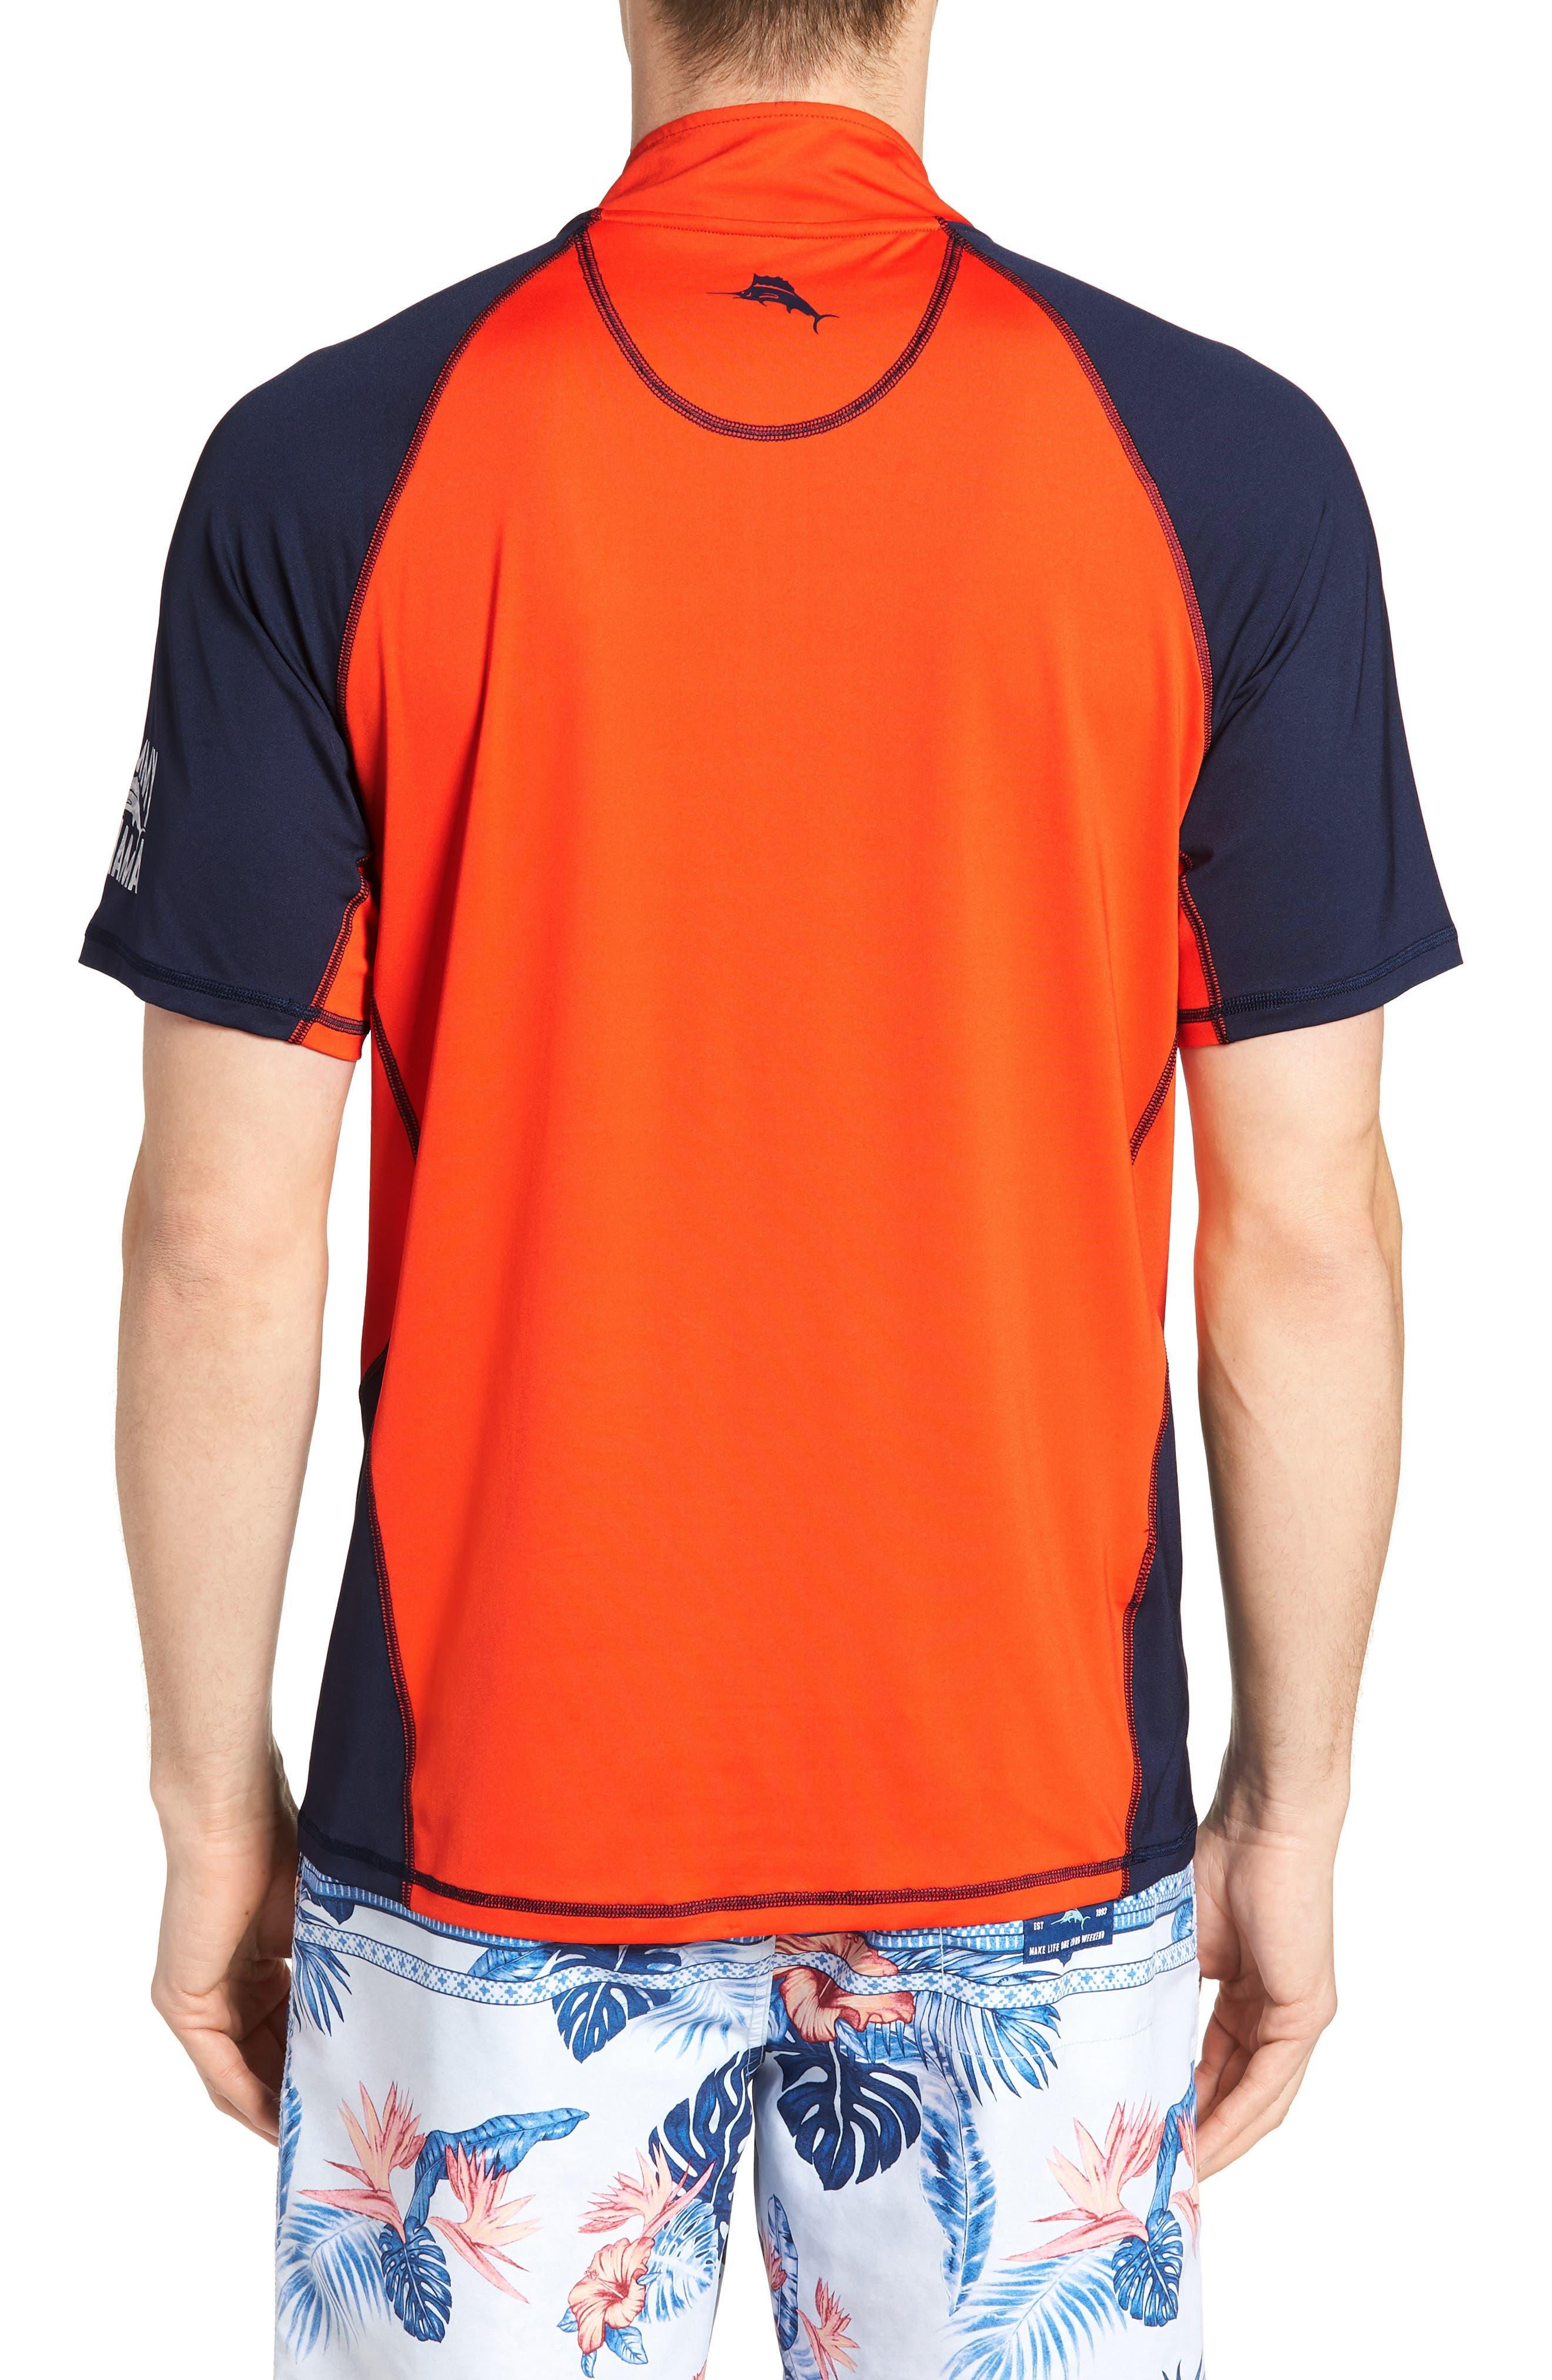 IslandActive<sup>™</sup> Colorblock Beach Pro Rashguard T-Shirt,                             Alternate thumbnail 4, color,